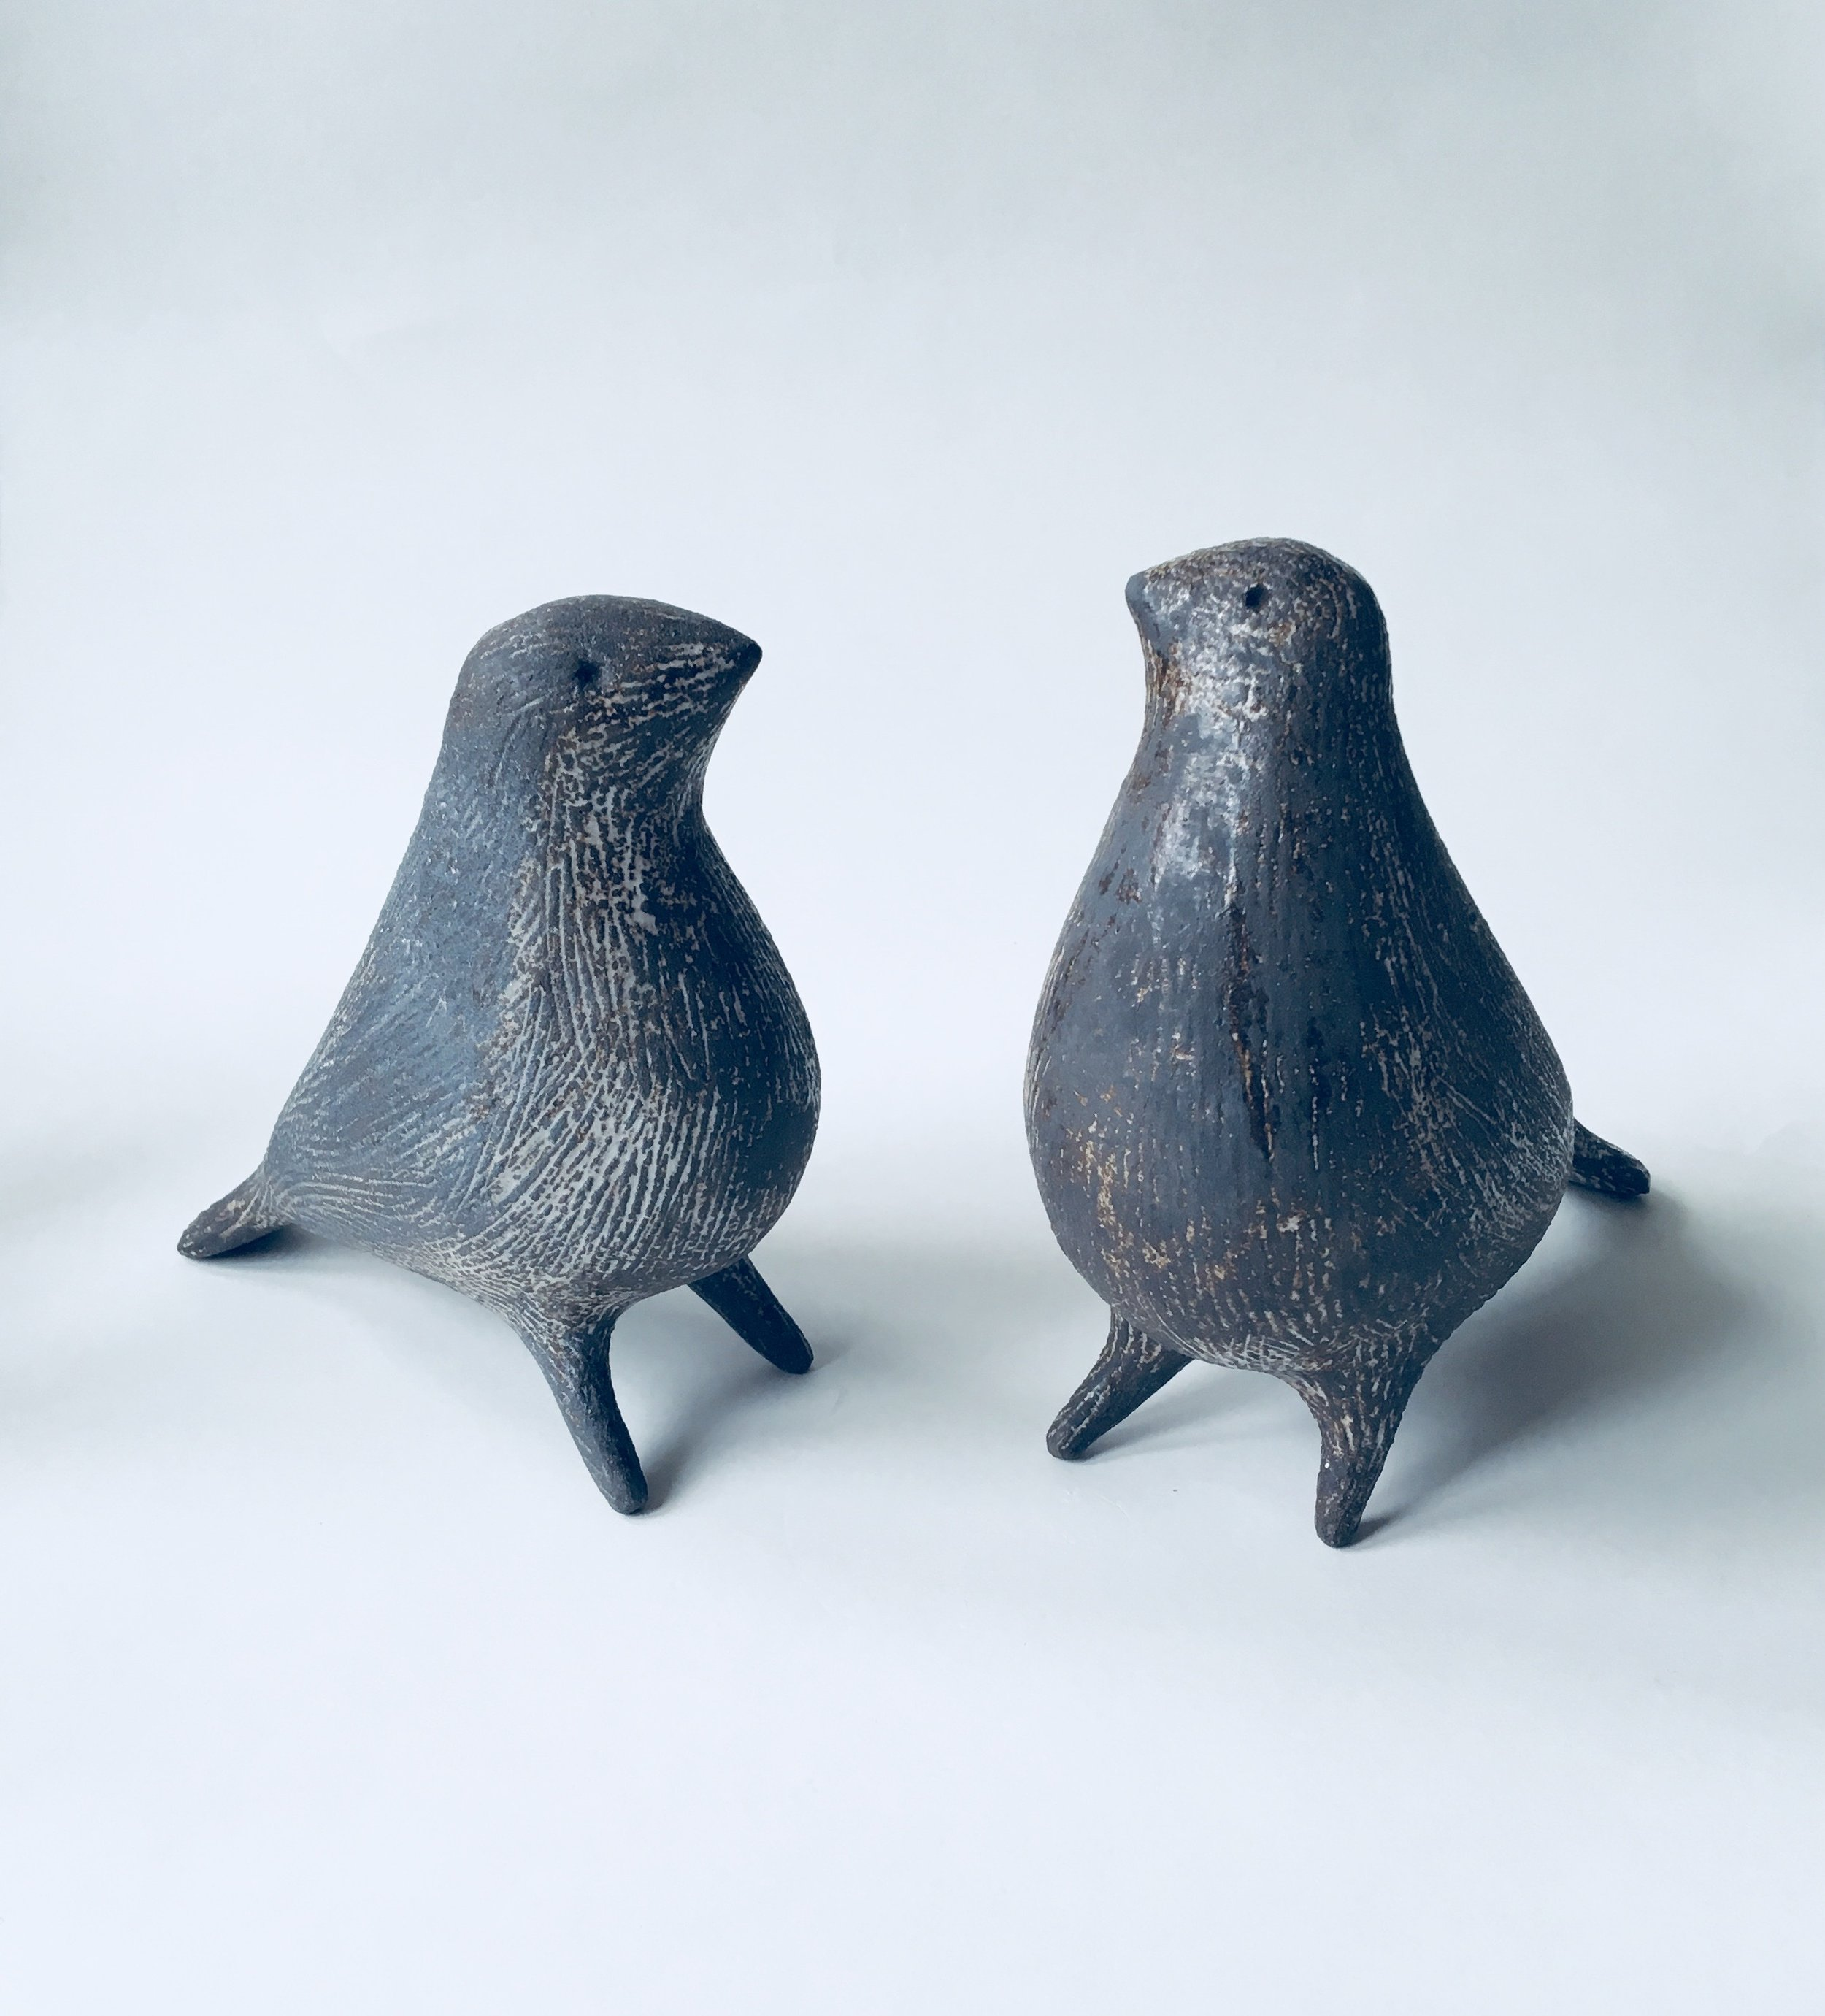 Artist: Julie Nelson  Title: Small Ponti Birds - Speckle 2 and Speckle 1  Size: H 15cm x W 8cm x L 15cm  Medium: Ceramic  Price: £175 each